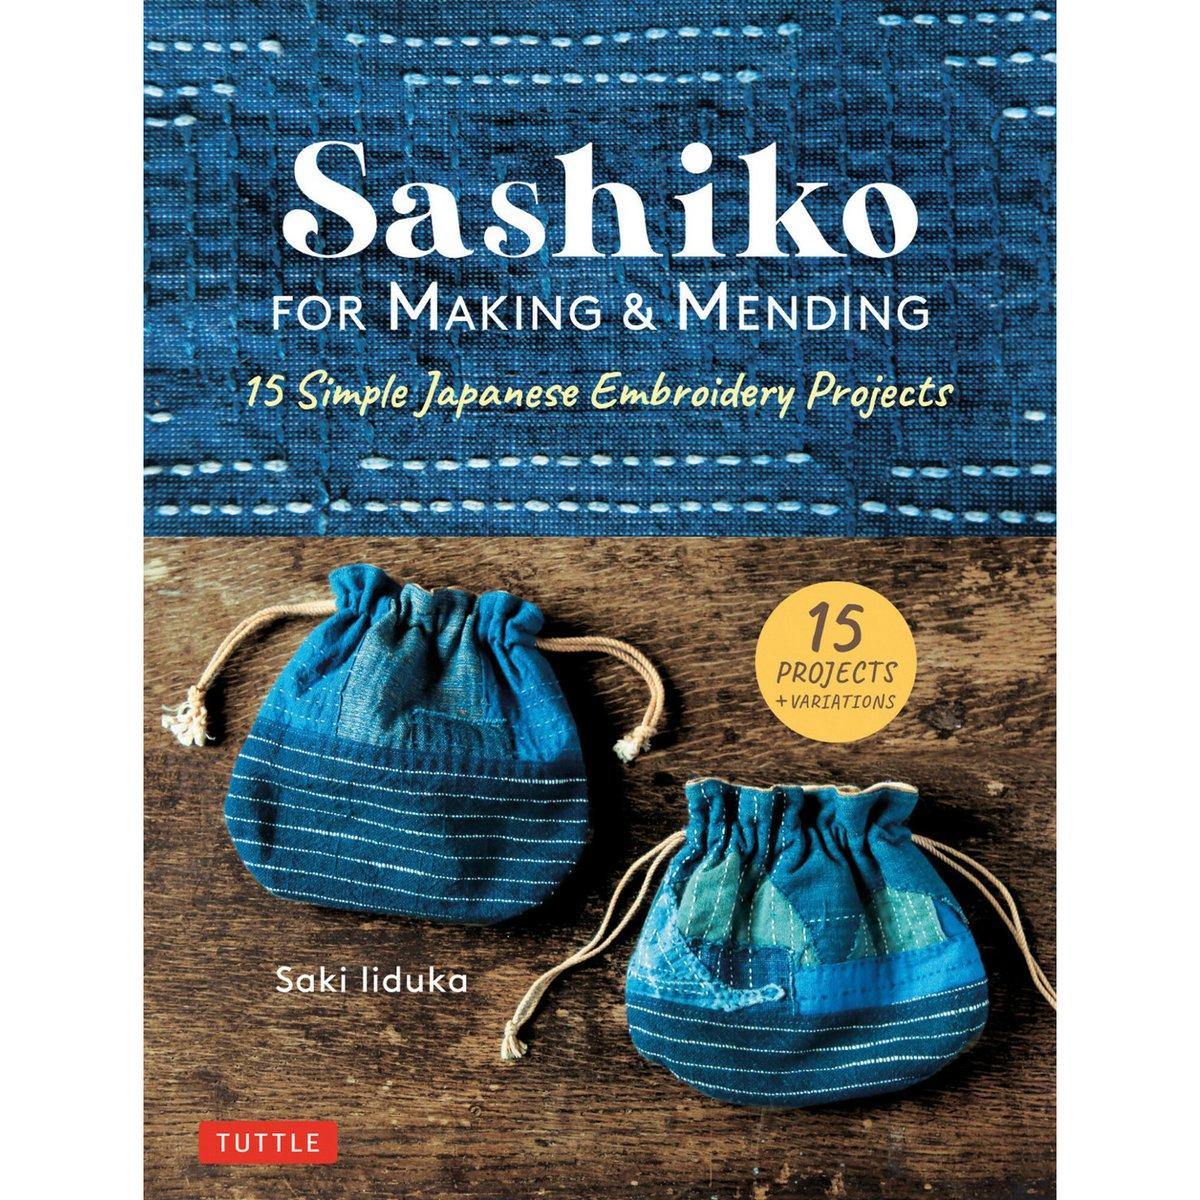 Image of Sashiko for Making & Mending